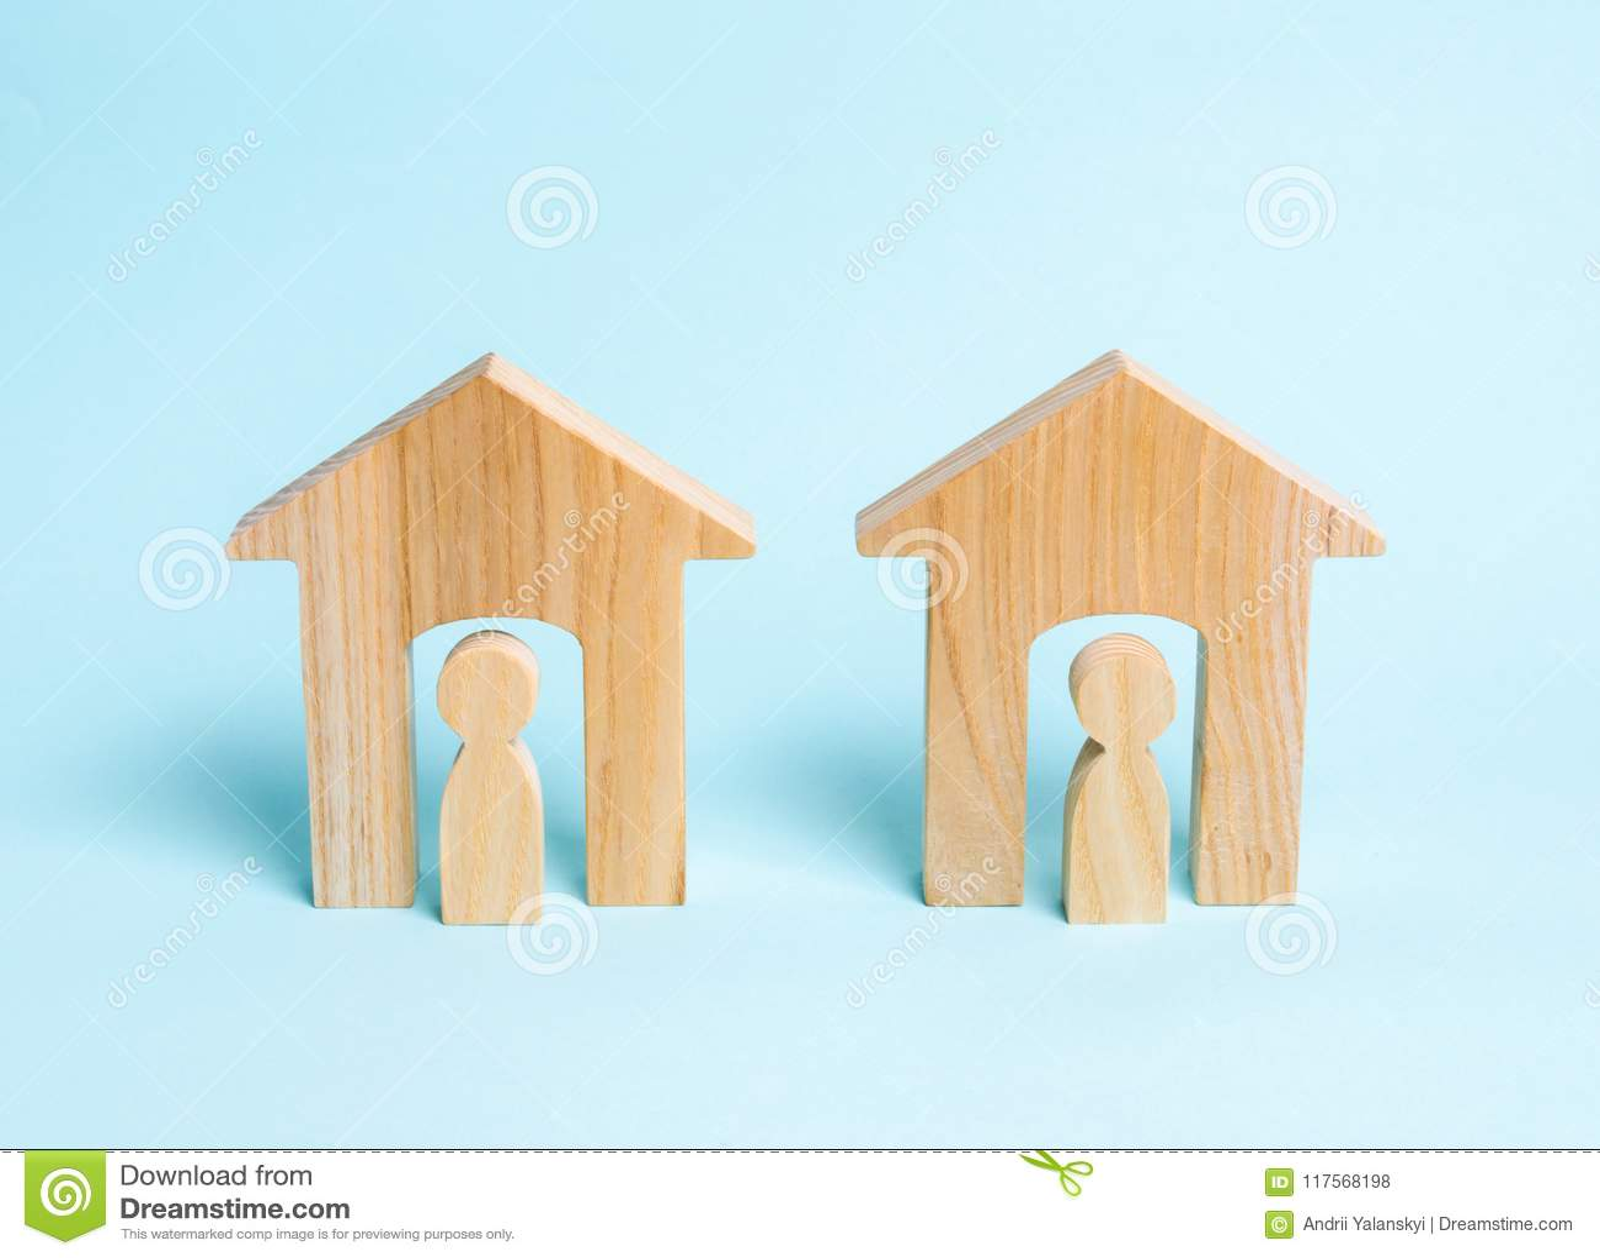 Two wooden houses with neighbors. Two neighbors. Good neighborhood, district. Communication, communication between two people